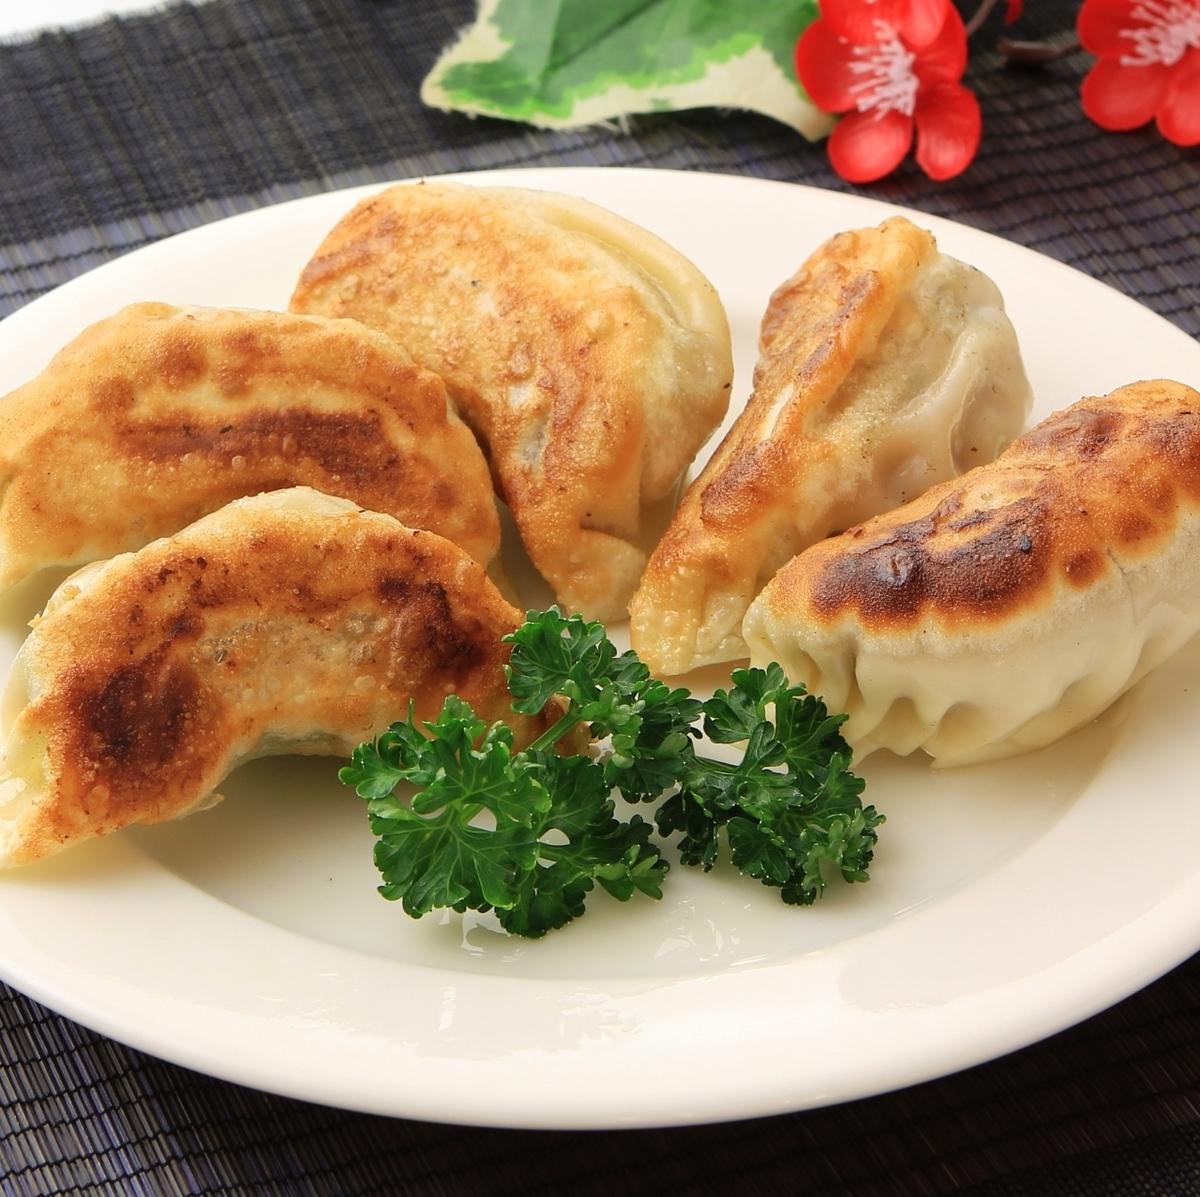 Baked dumplings